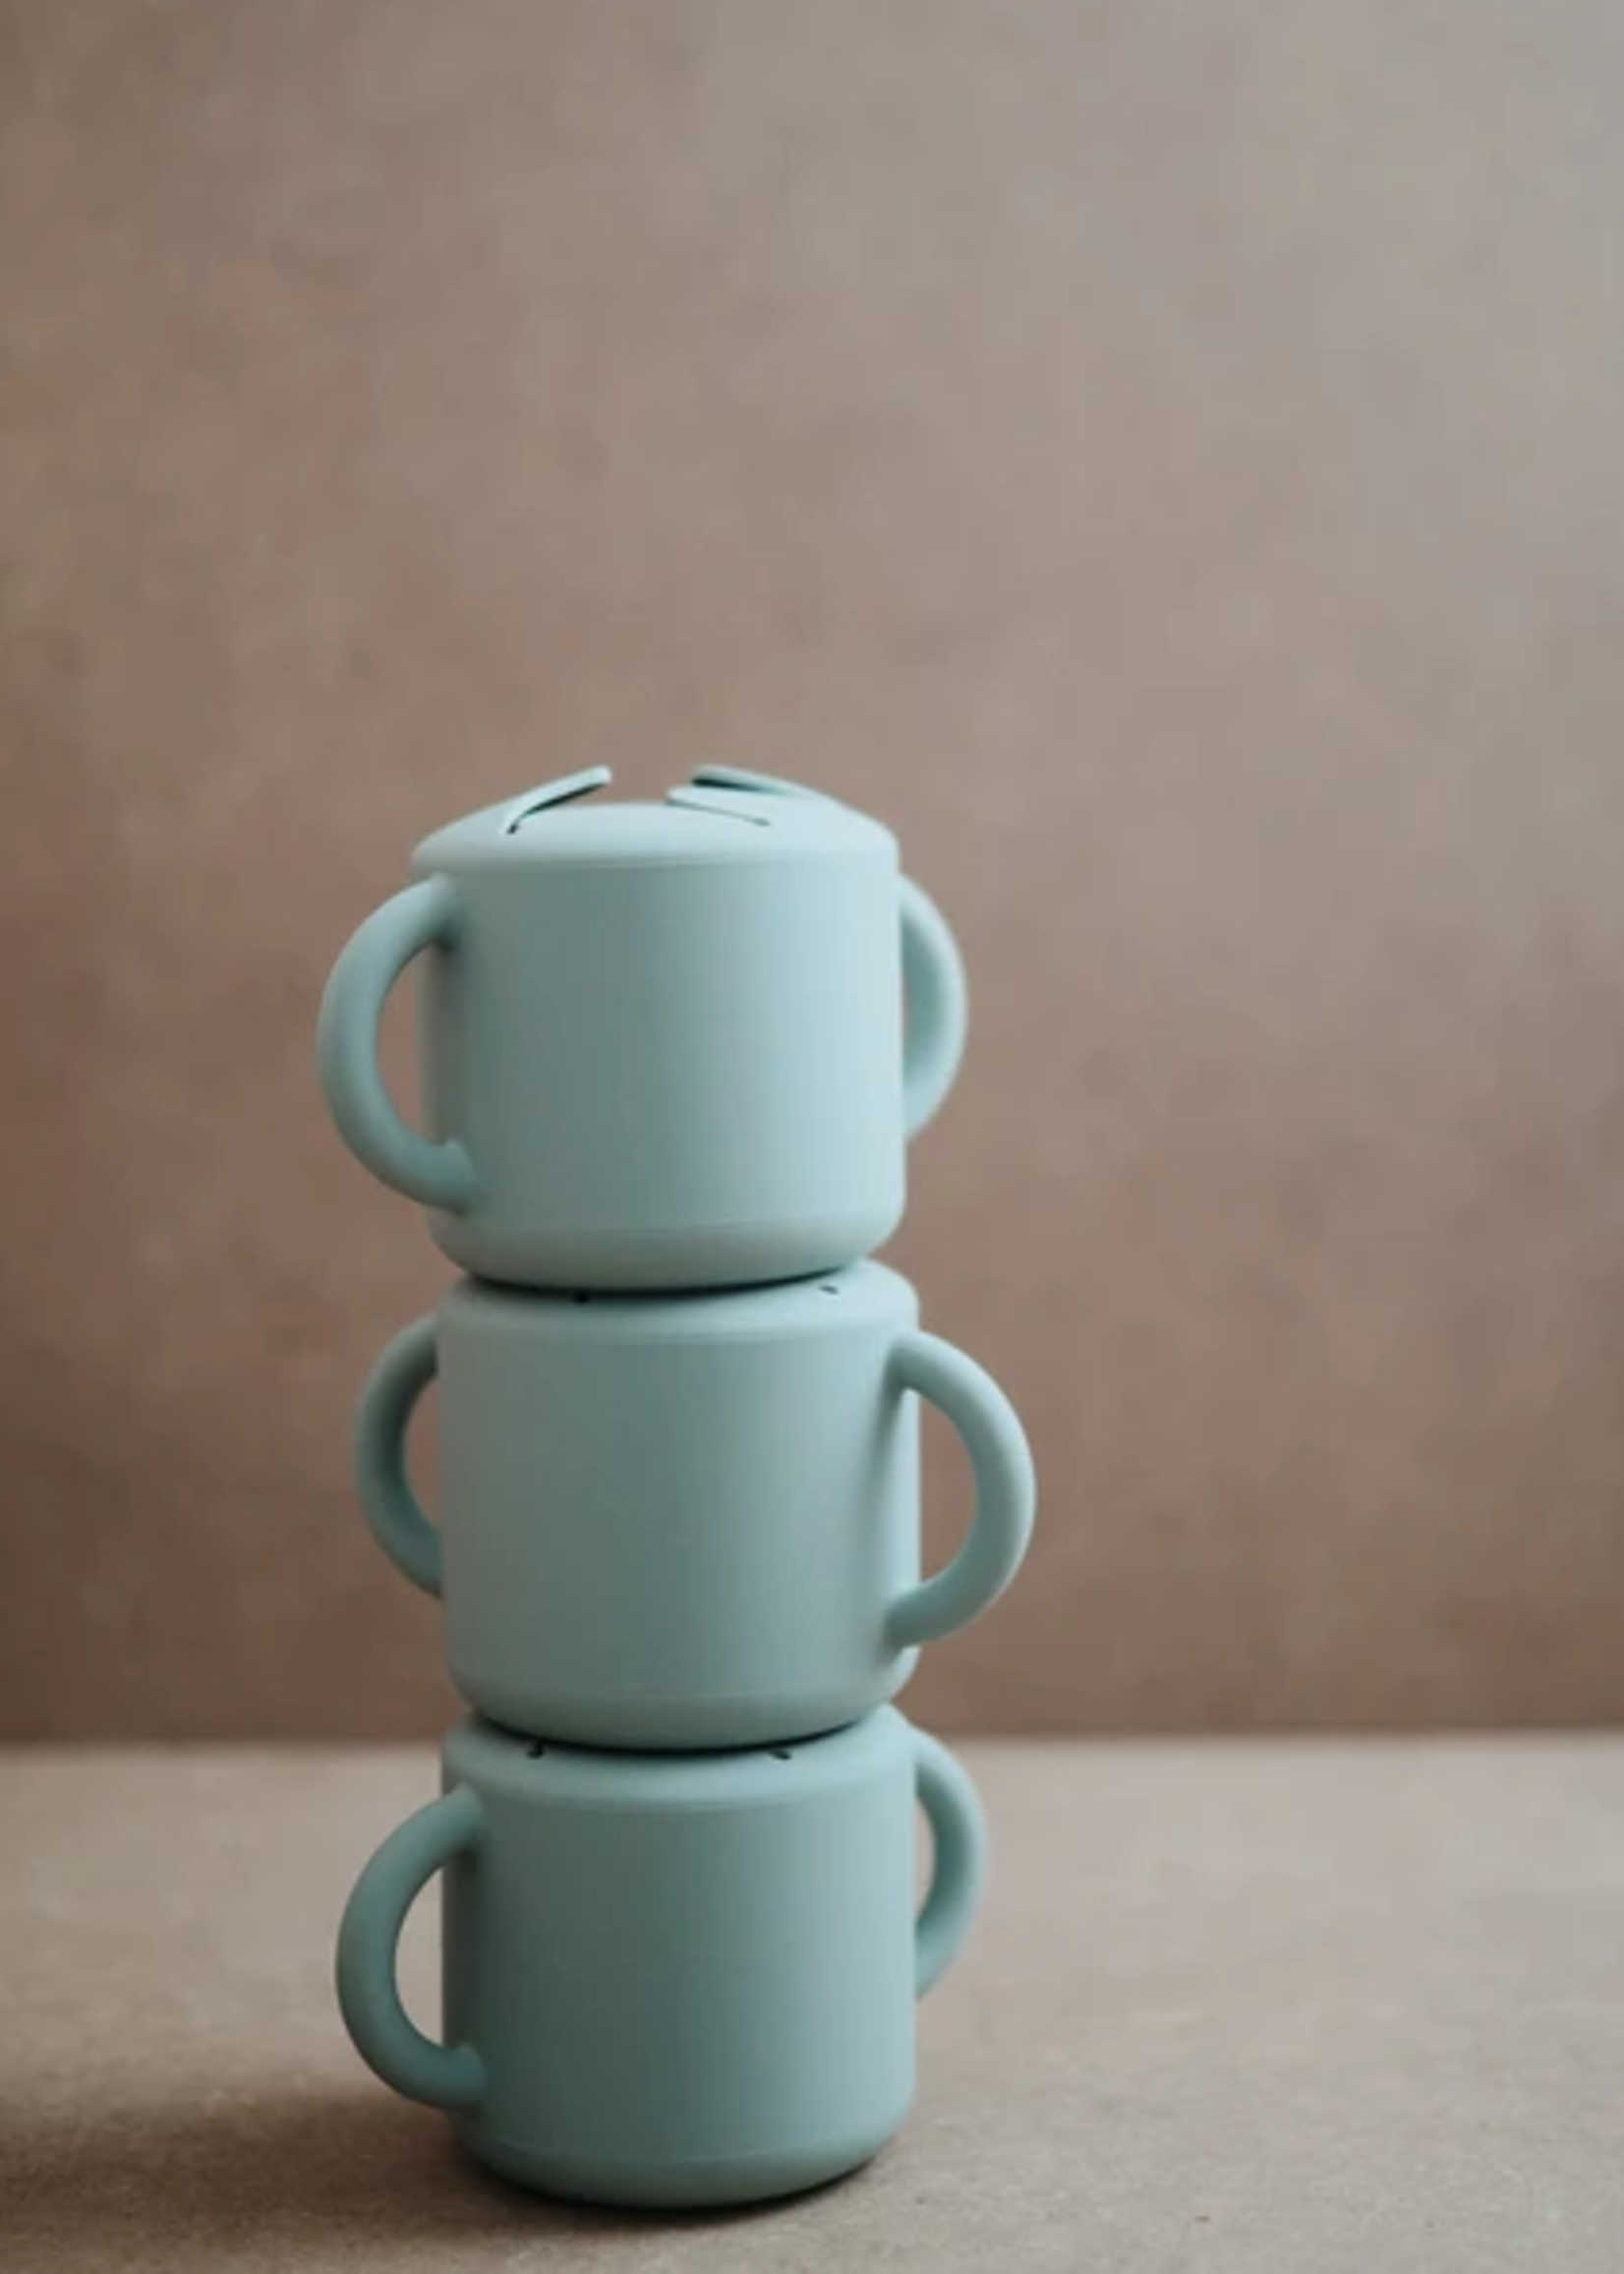 Elitaire Petite Snack Cup in Cambridge Blue